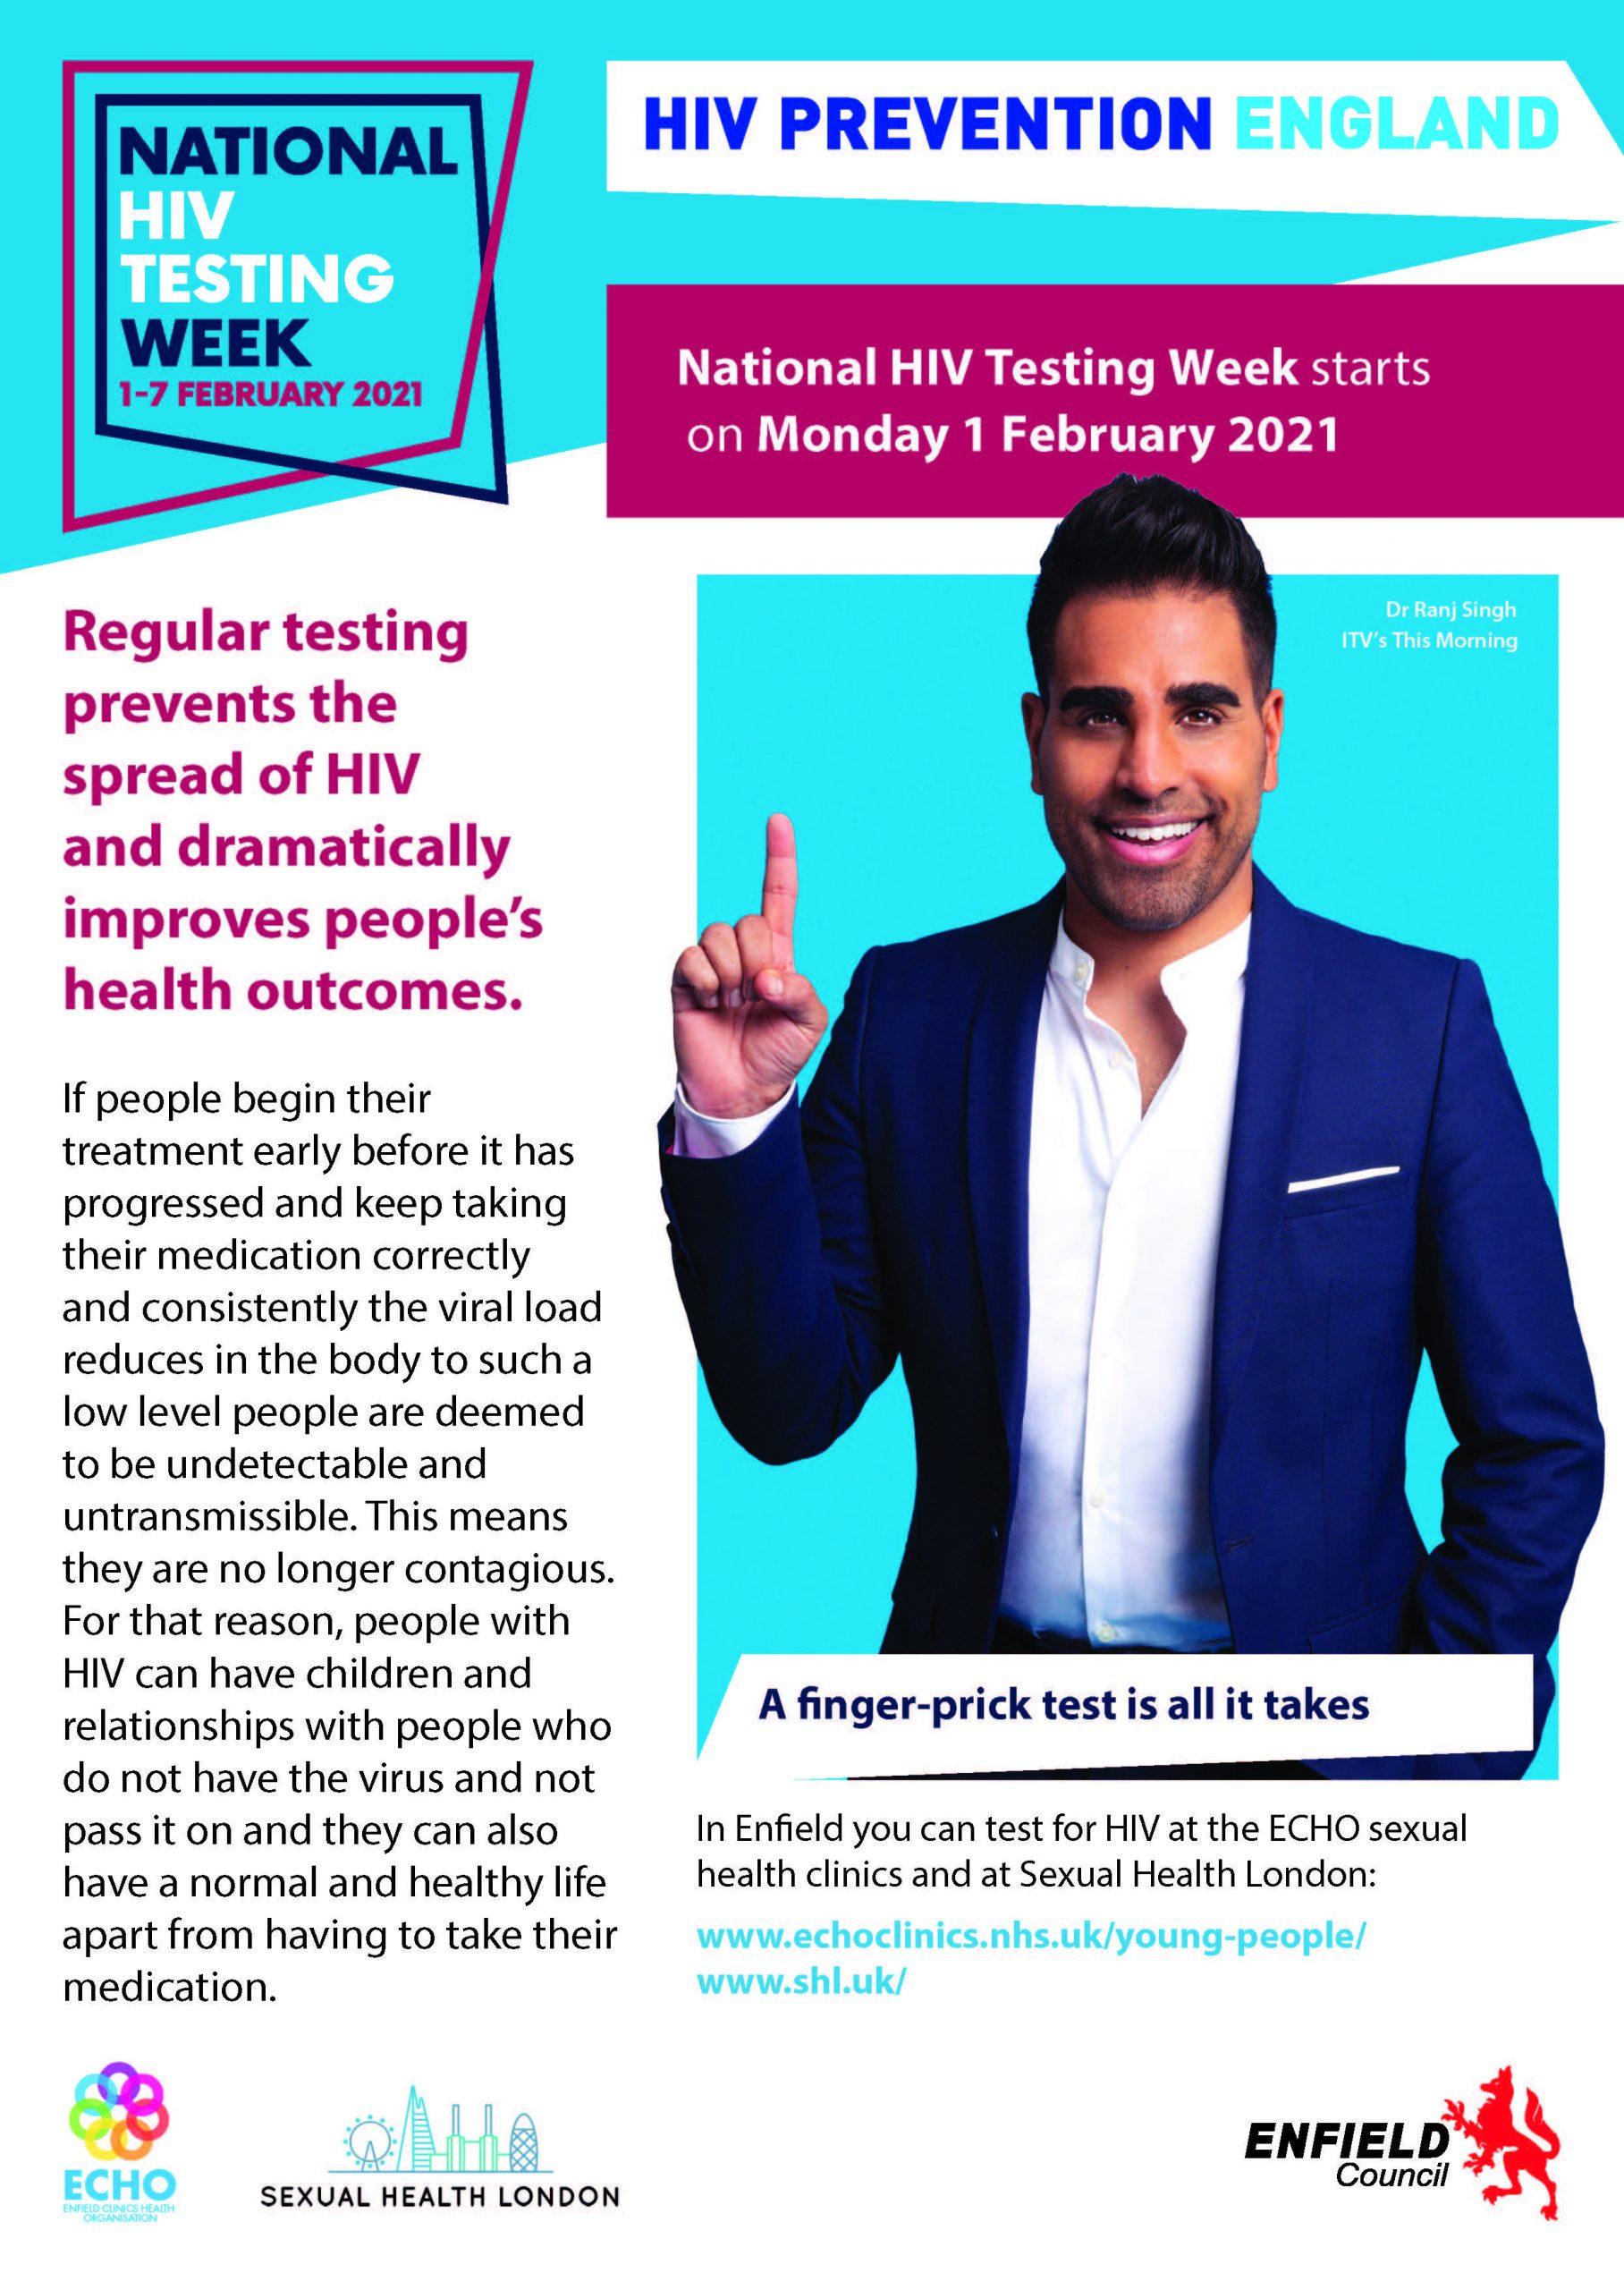 National HIV Testing Week starts 1st Feb